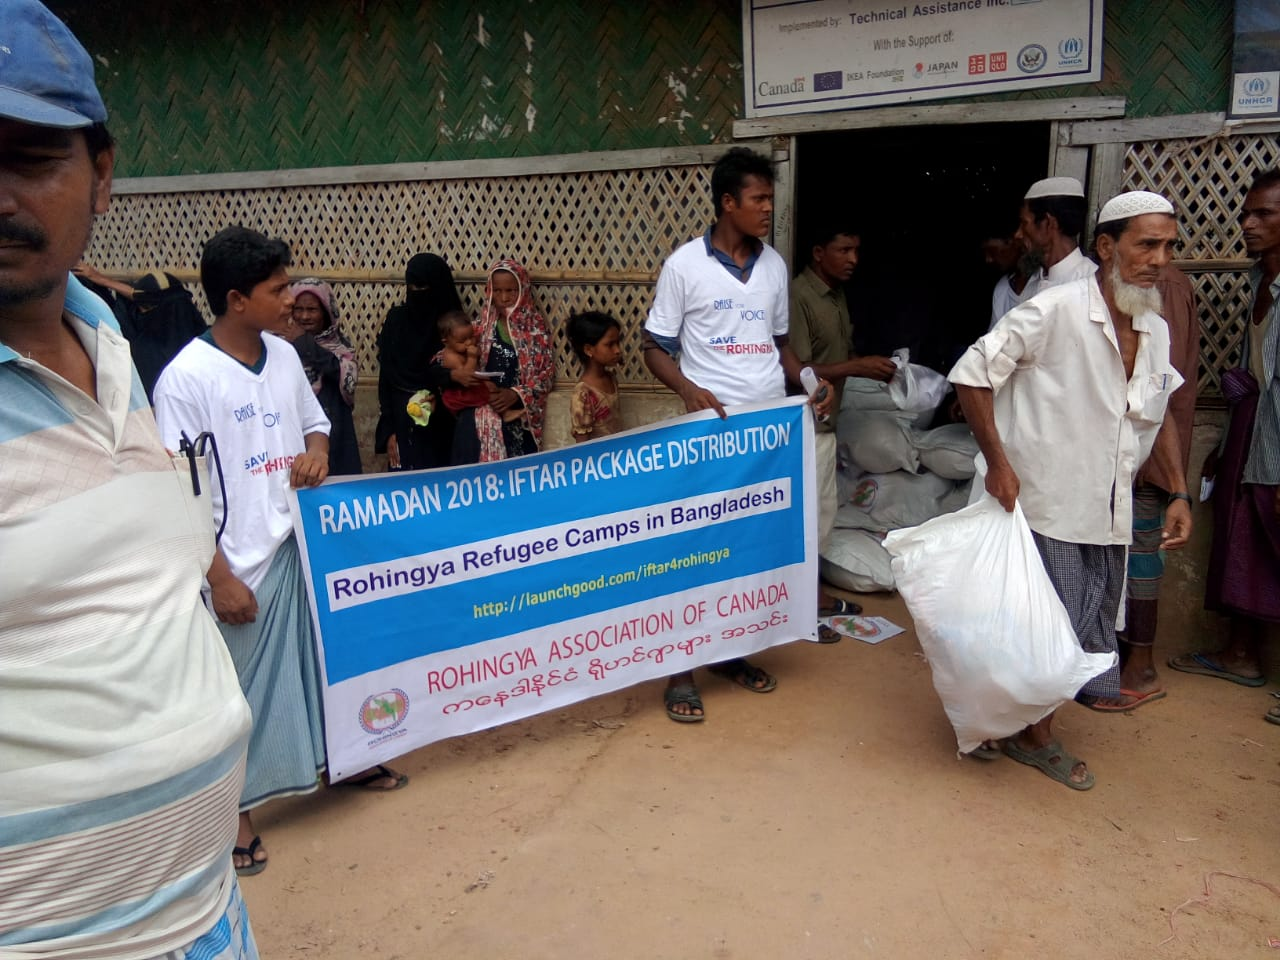 Projects | IFTARI For Rohingya | LaunchGood